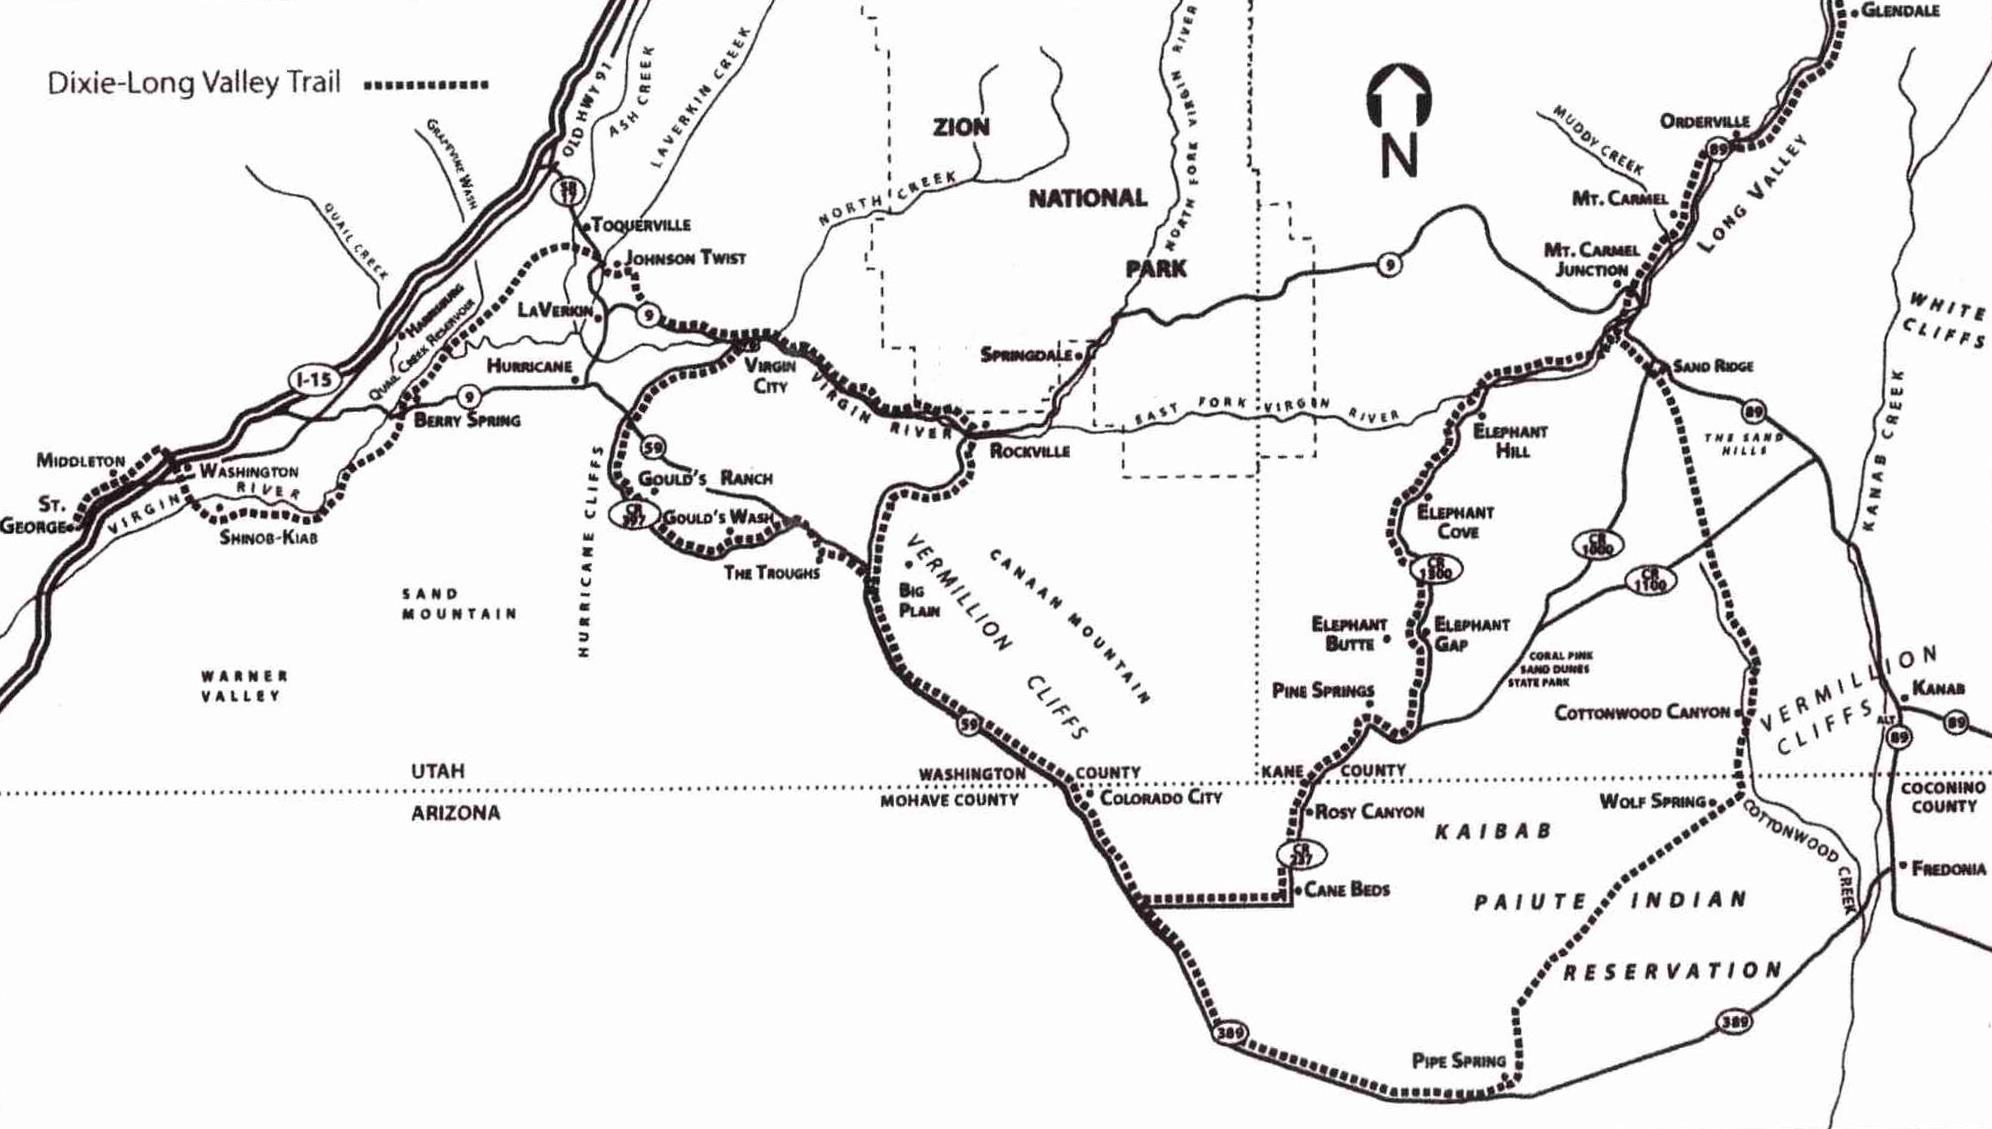 Washington County Maps And Charts - Rand macnally southwestern us road map